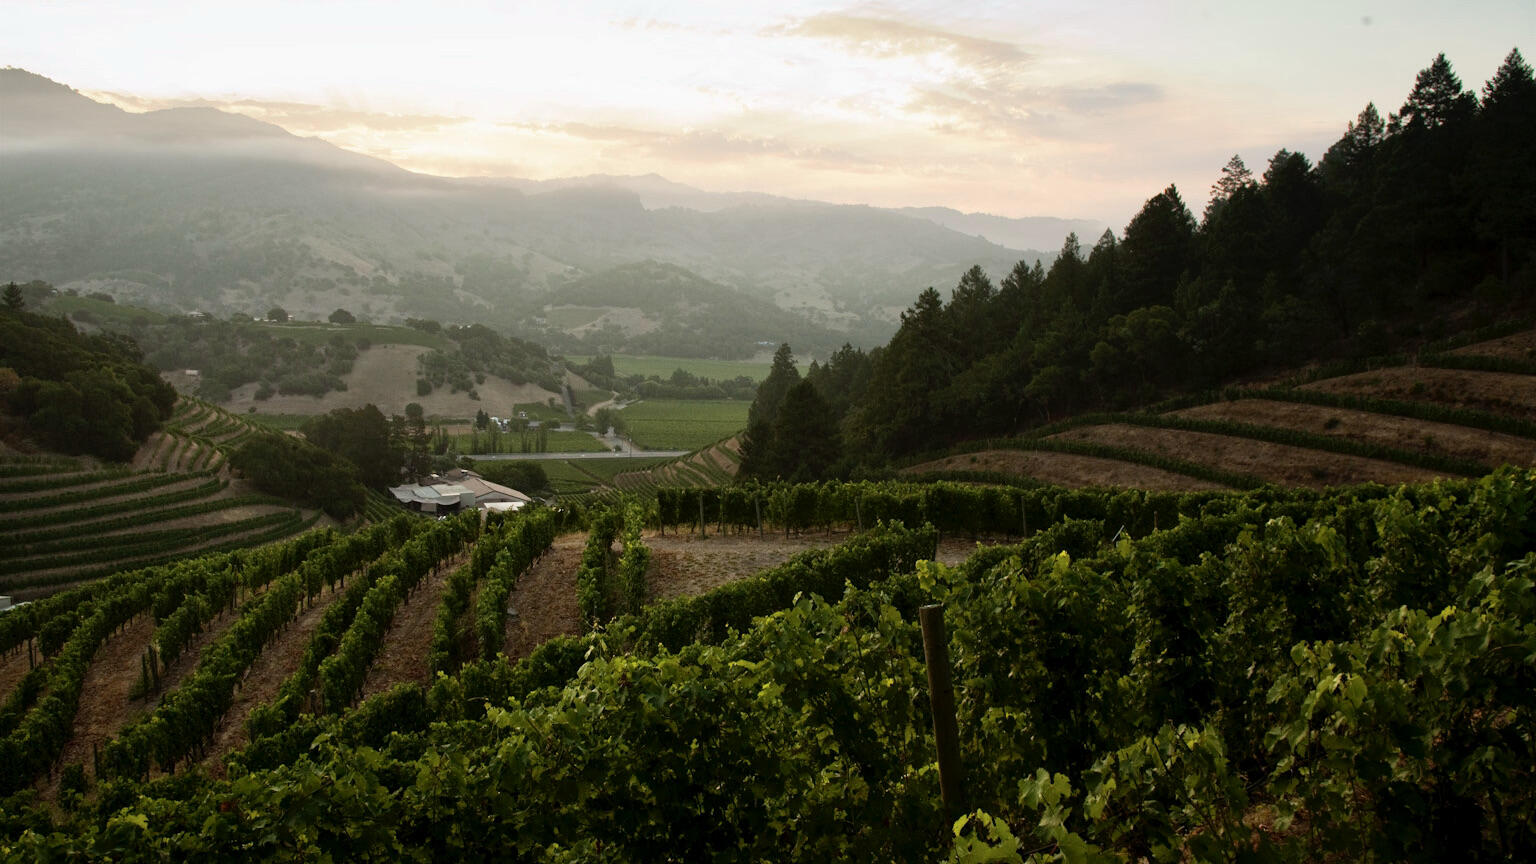 Pine Ridge Vineyards Cover Image